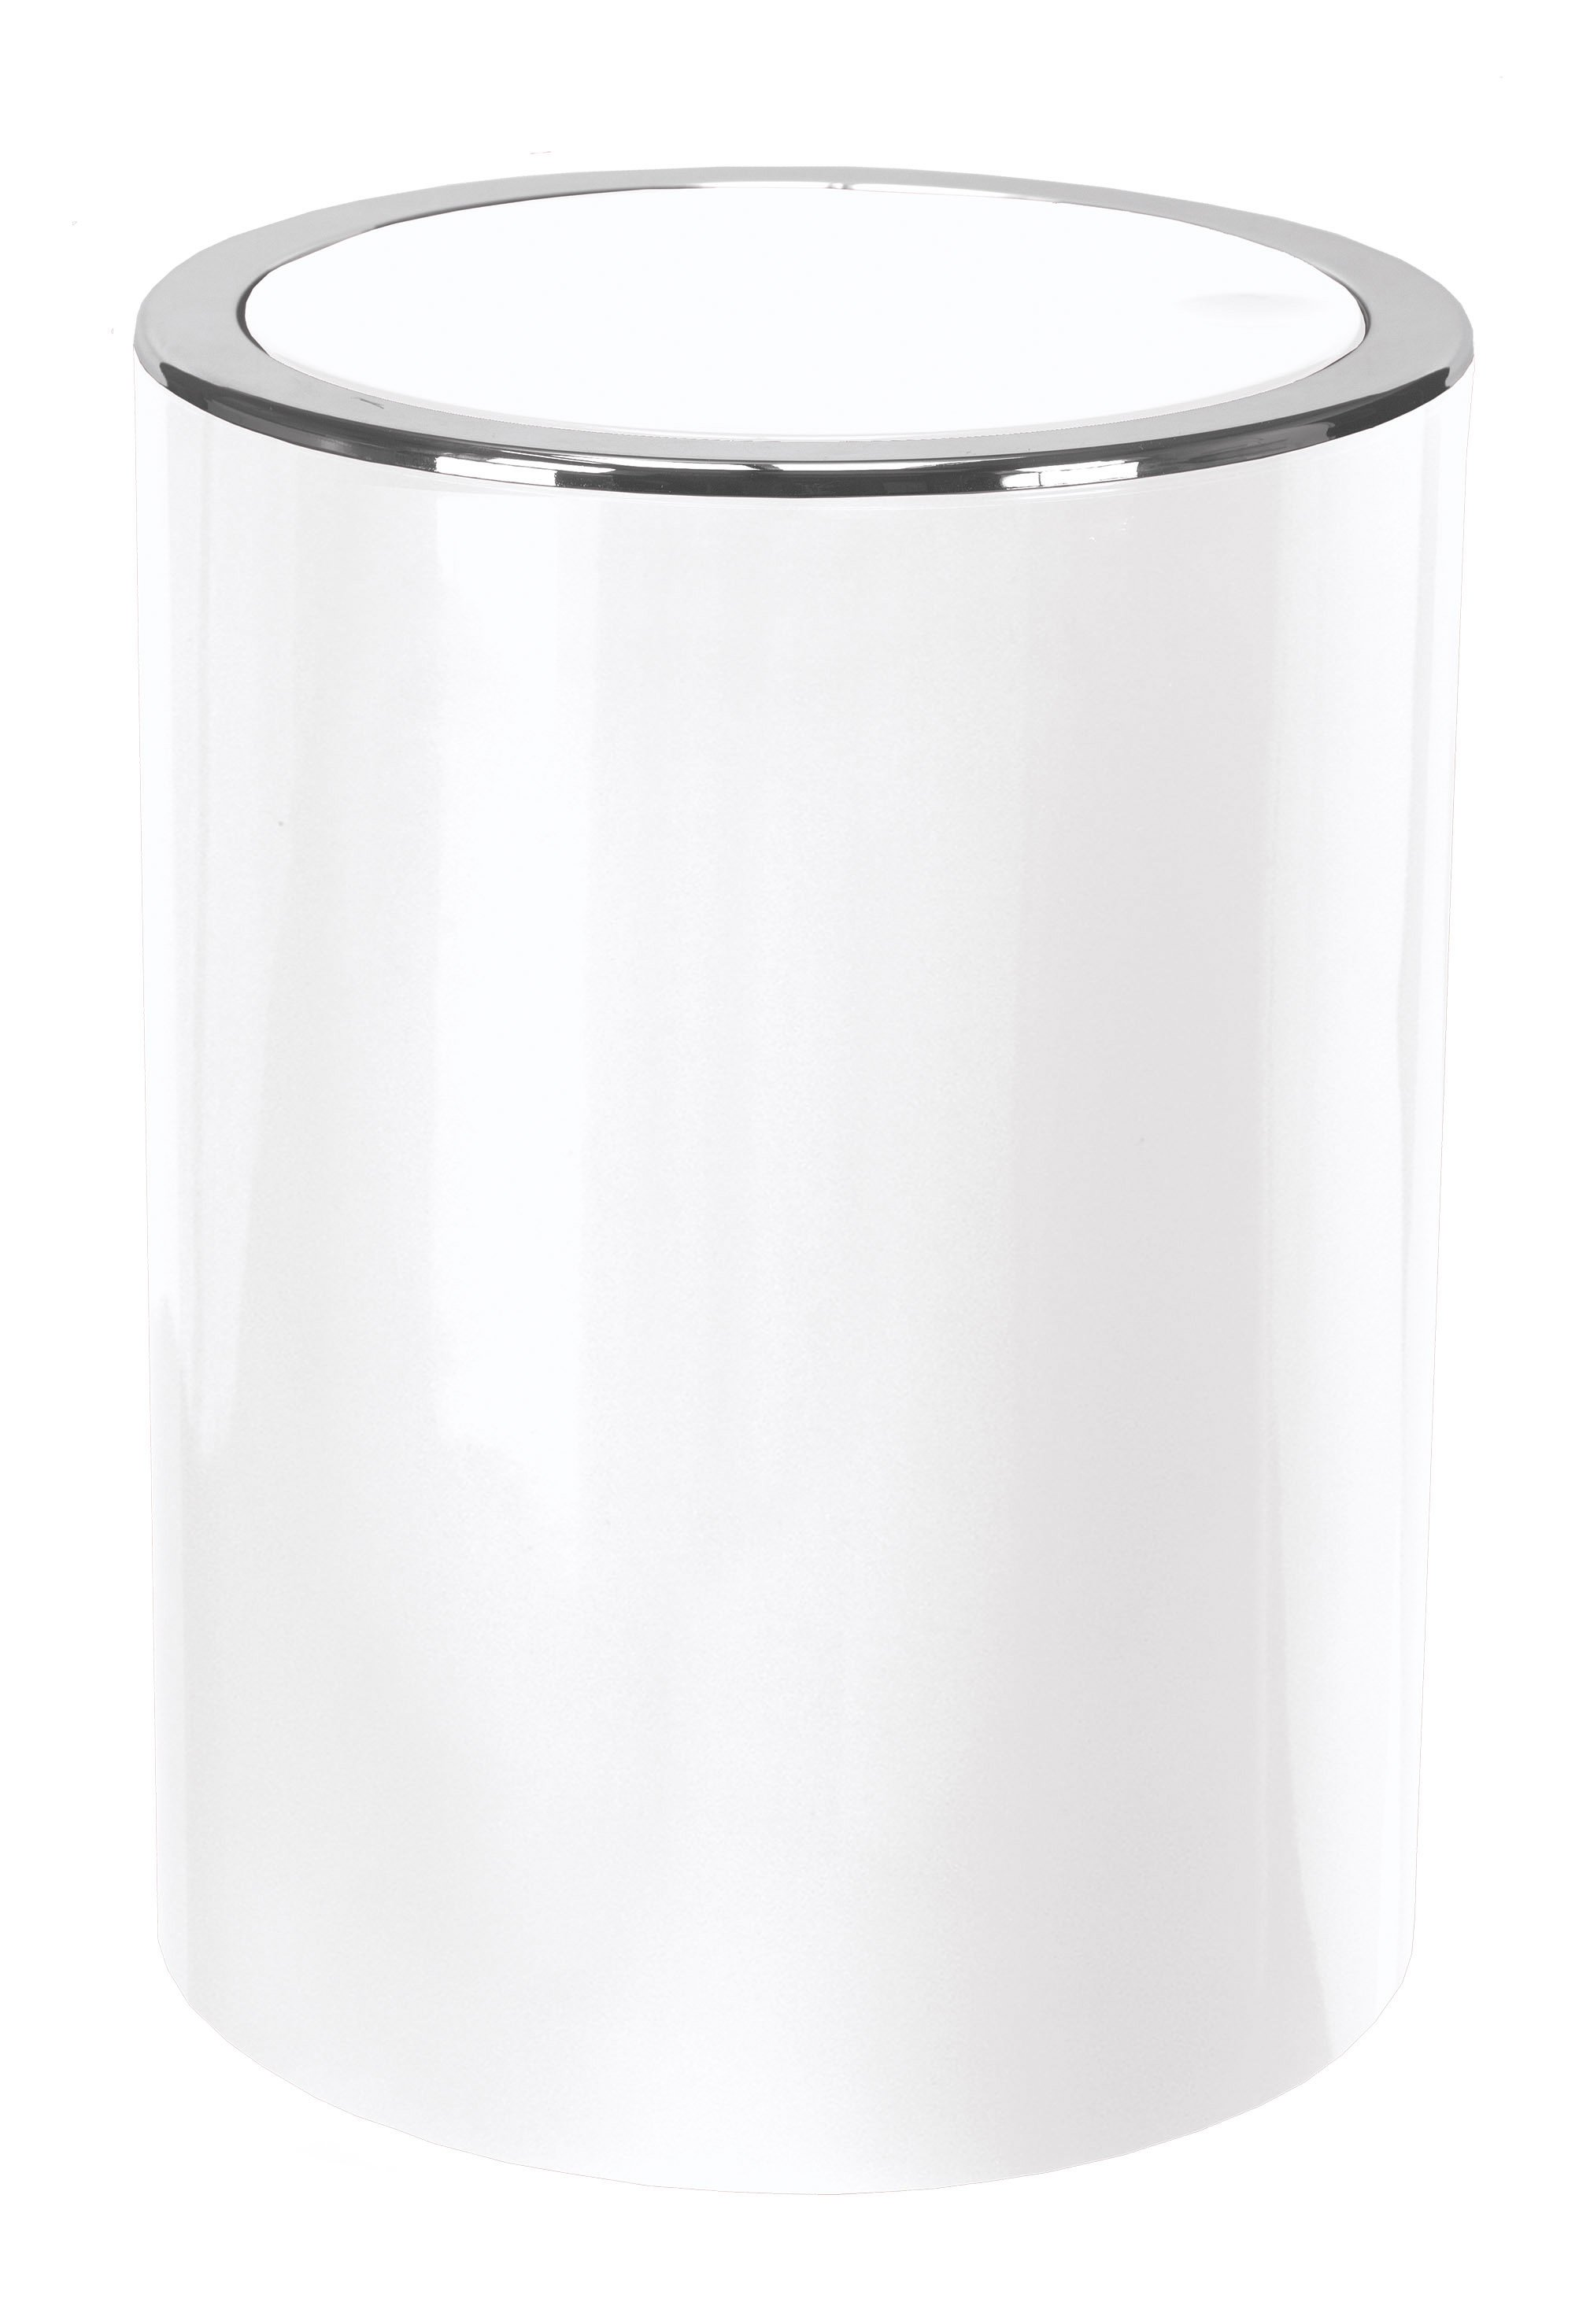 Kosmetikeimer Clap Mini Schneeweiss B:11cm